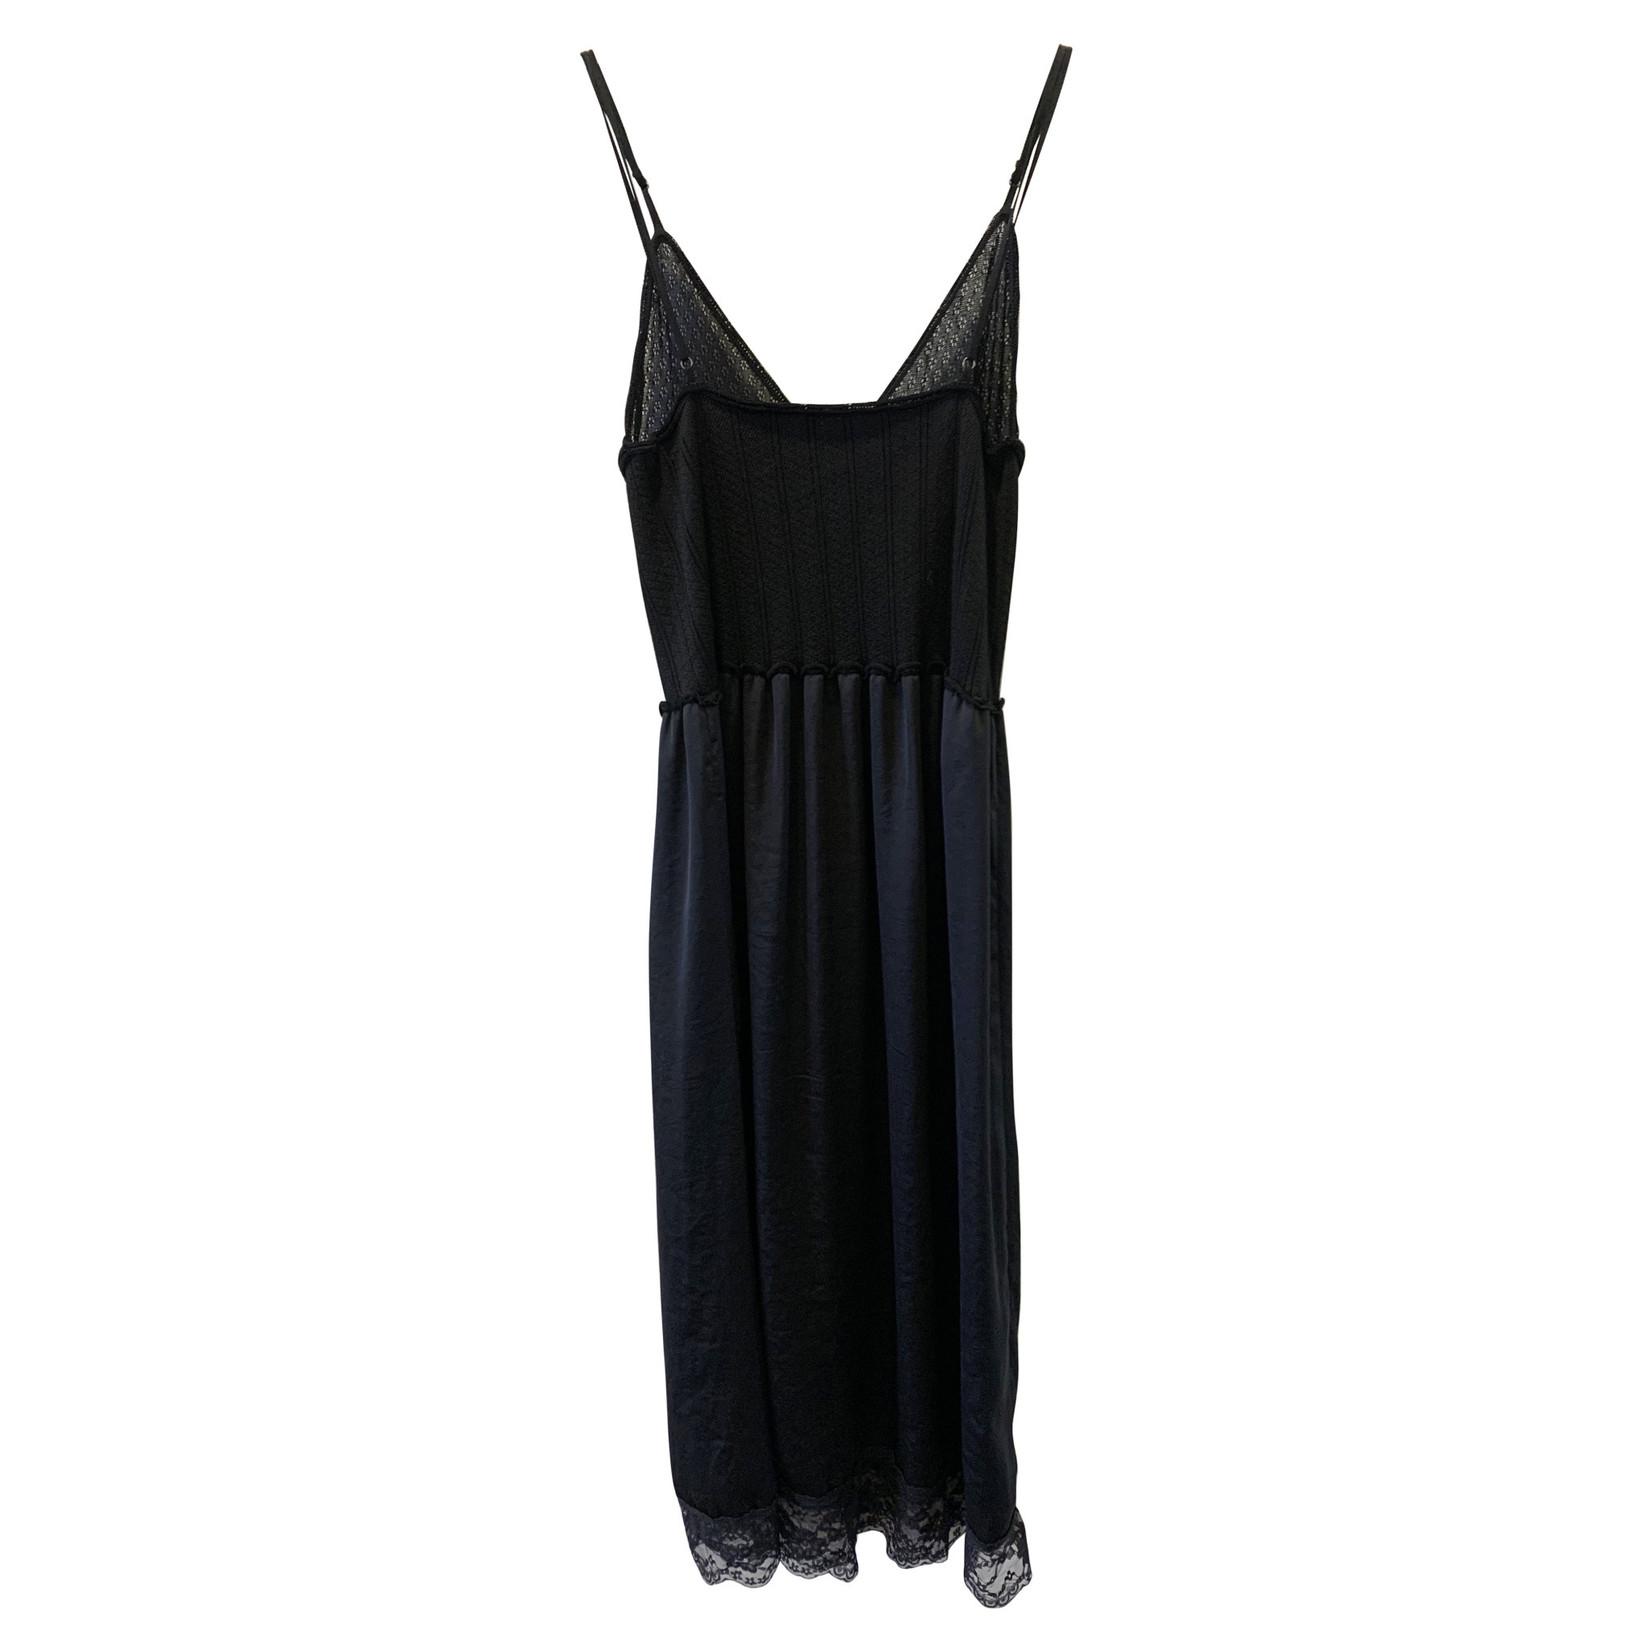 Alexander McQueen Alexander McQueen Black Silk Dress